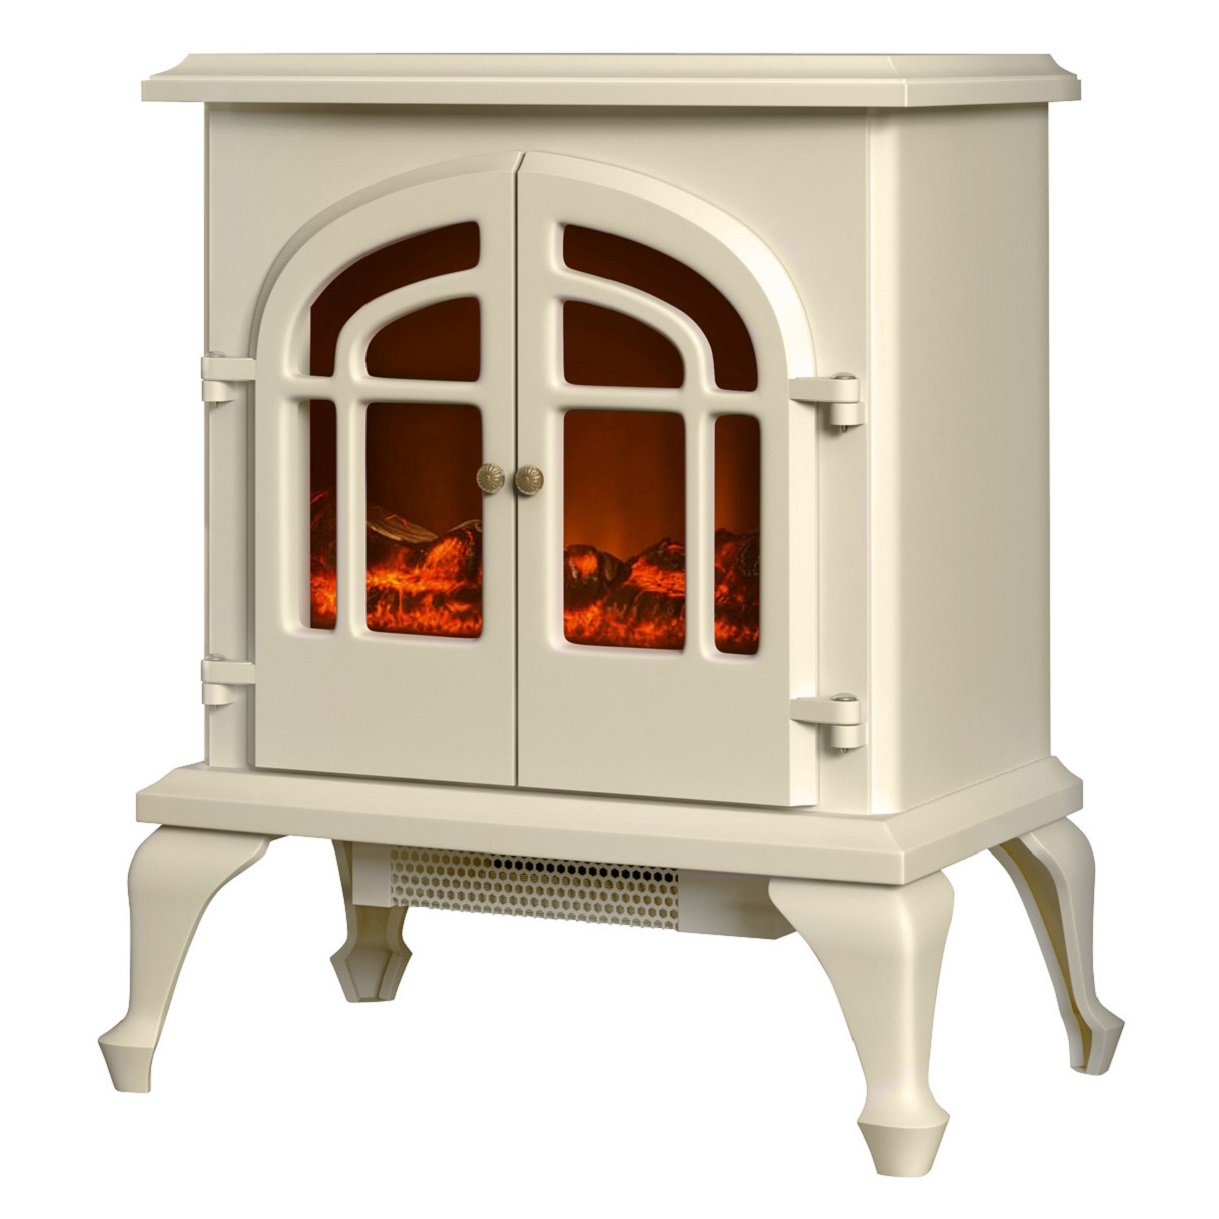 warmlite wl46015c log effect stove fire 2000 w cream amazon co